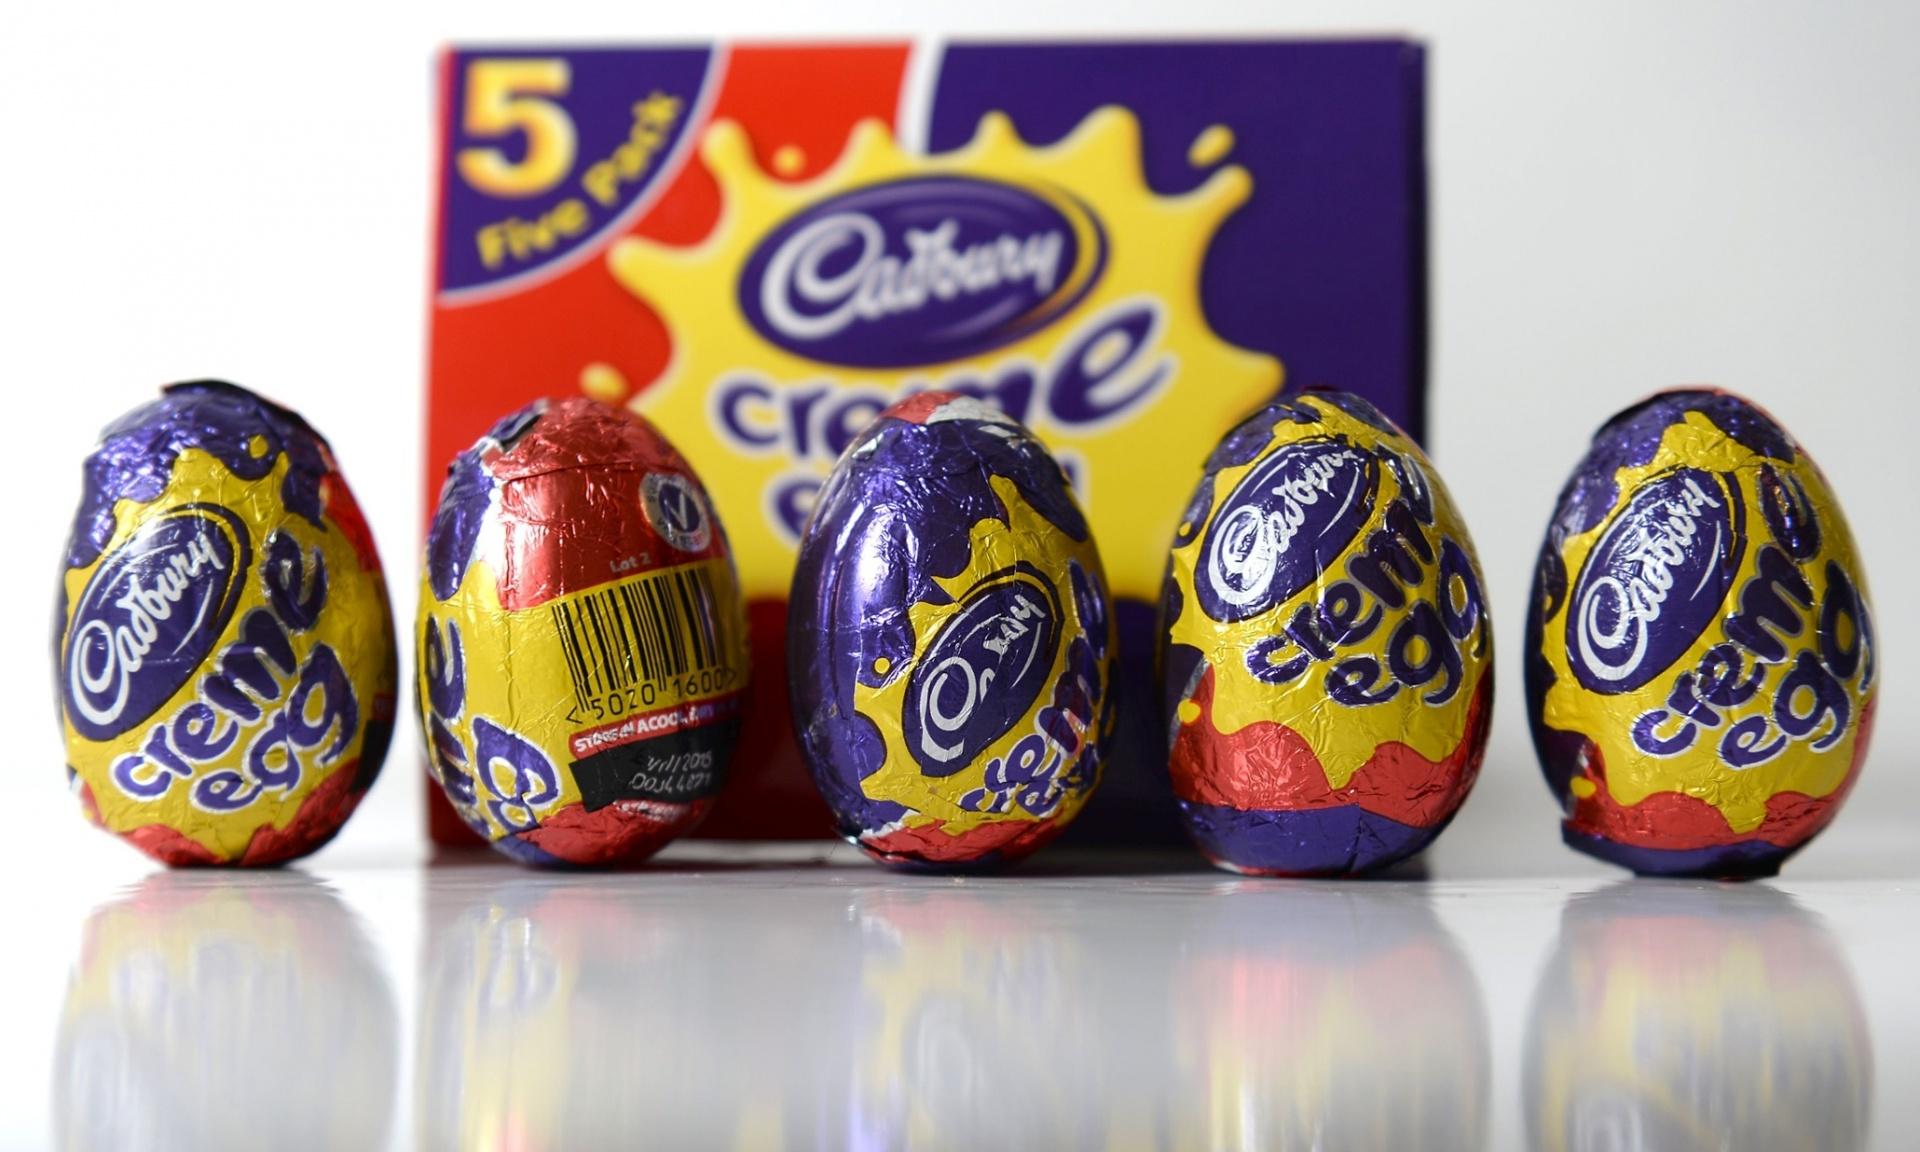 cadburys creme egg announcement - HD1920×1152